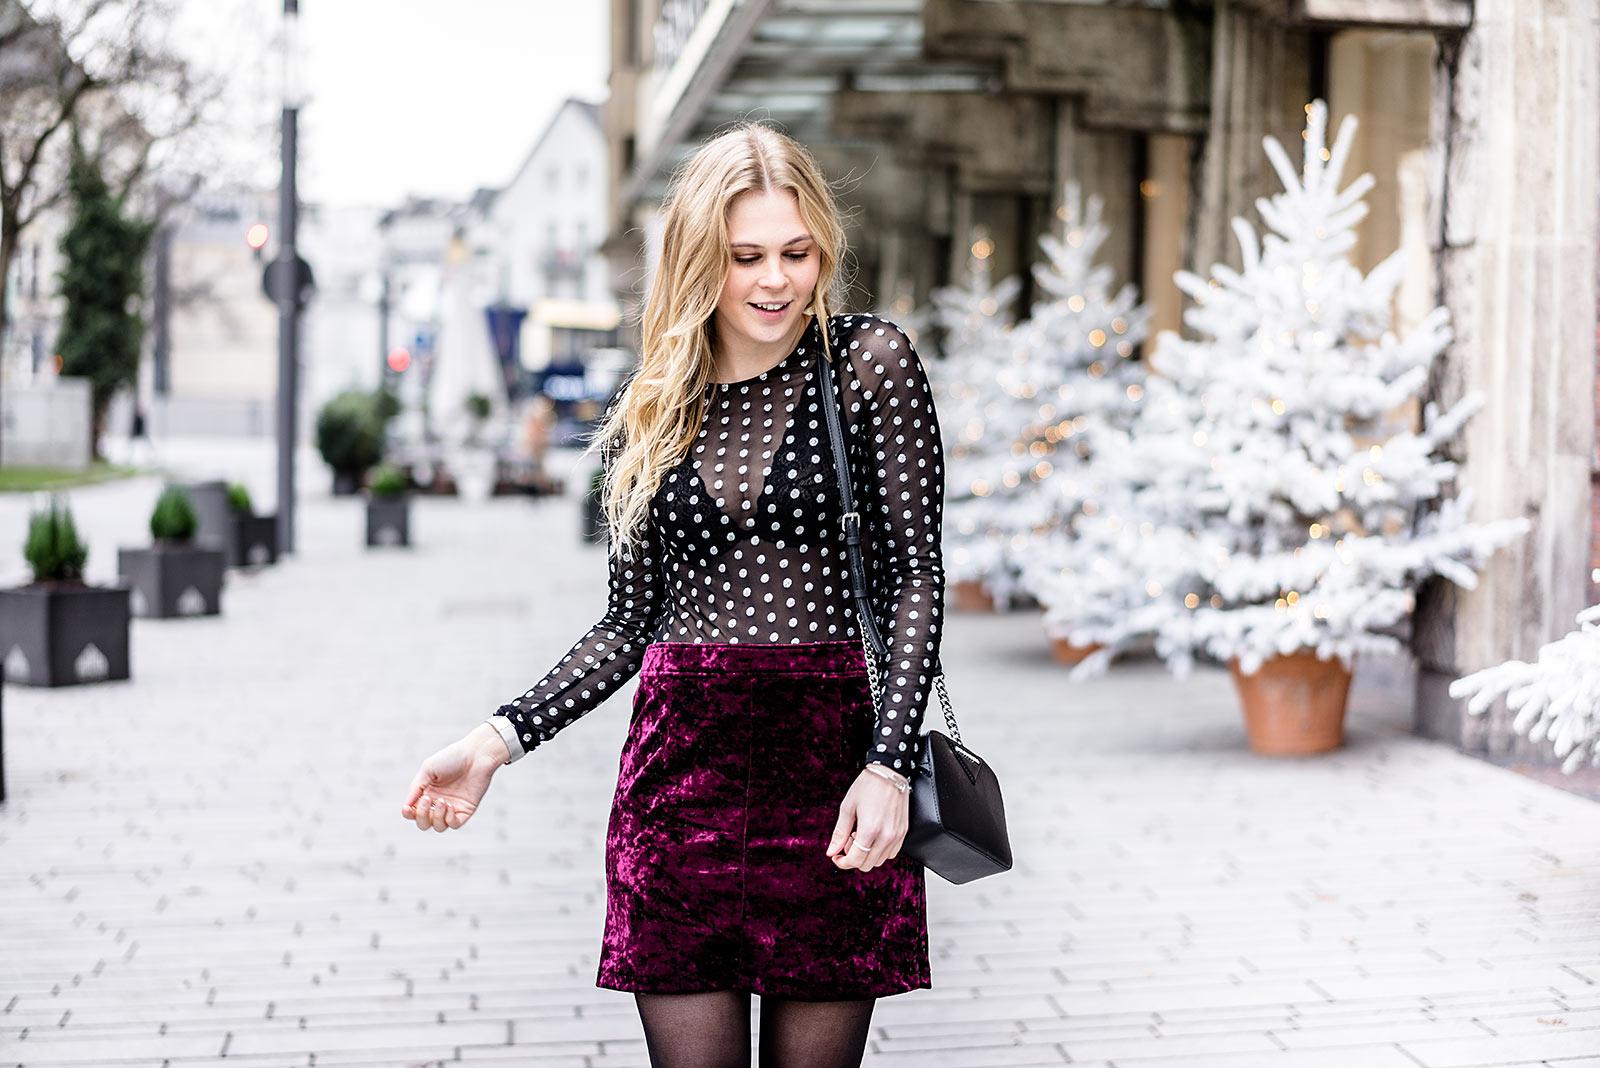 Durchsichtiges Oberteil Silvester Outfit schwarz Rock Fashionblog Sunnyinga